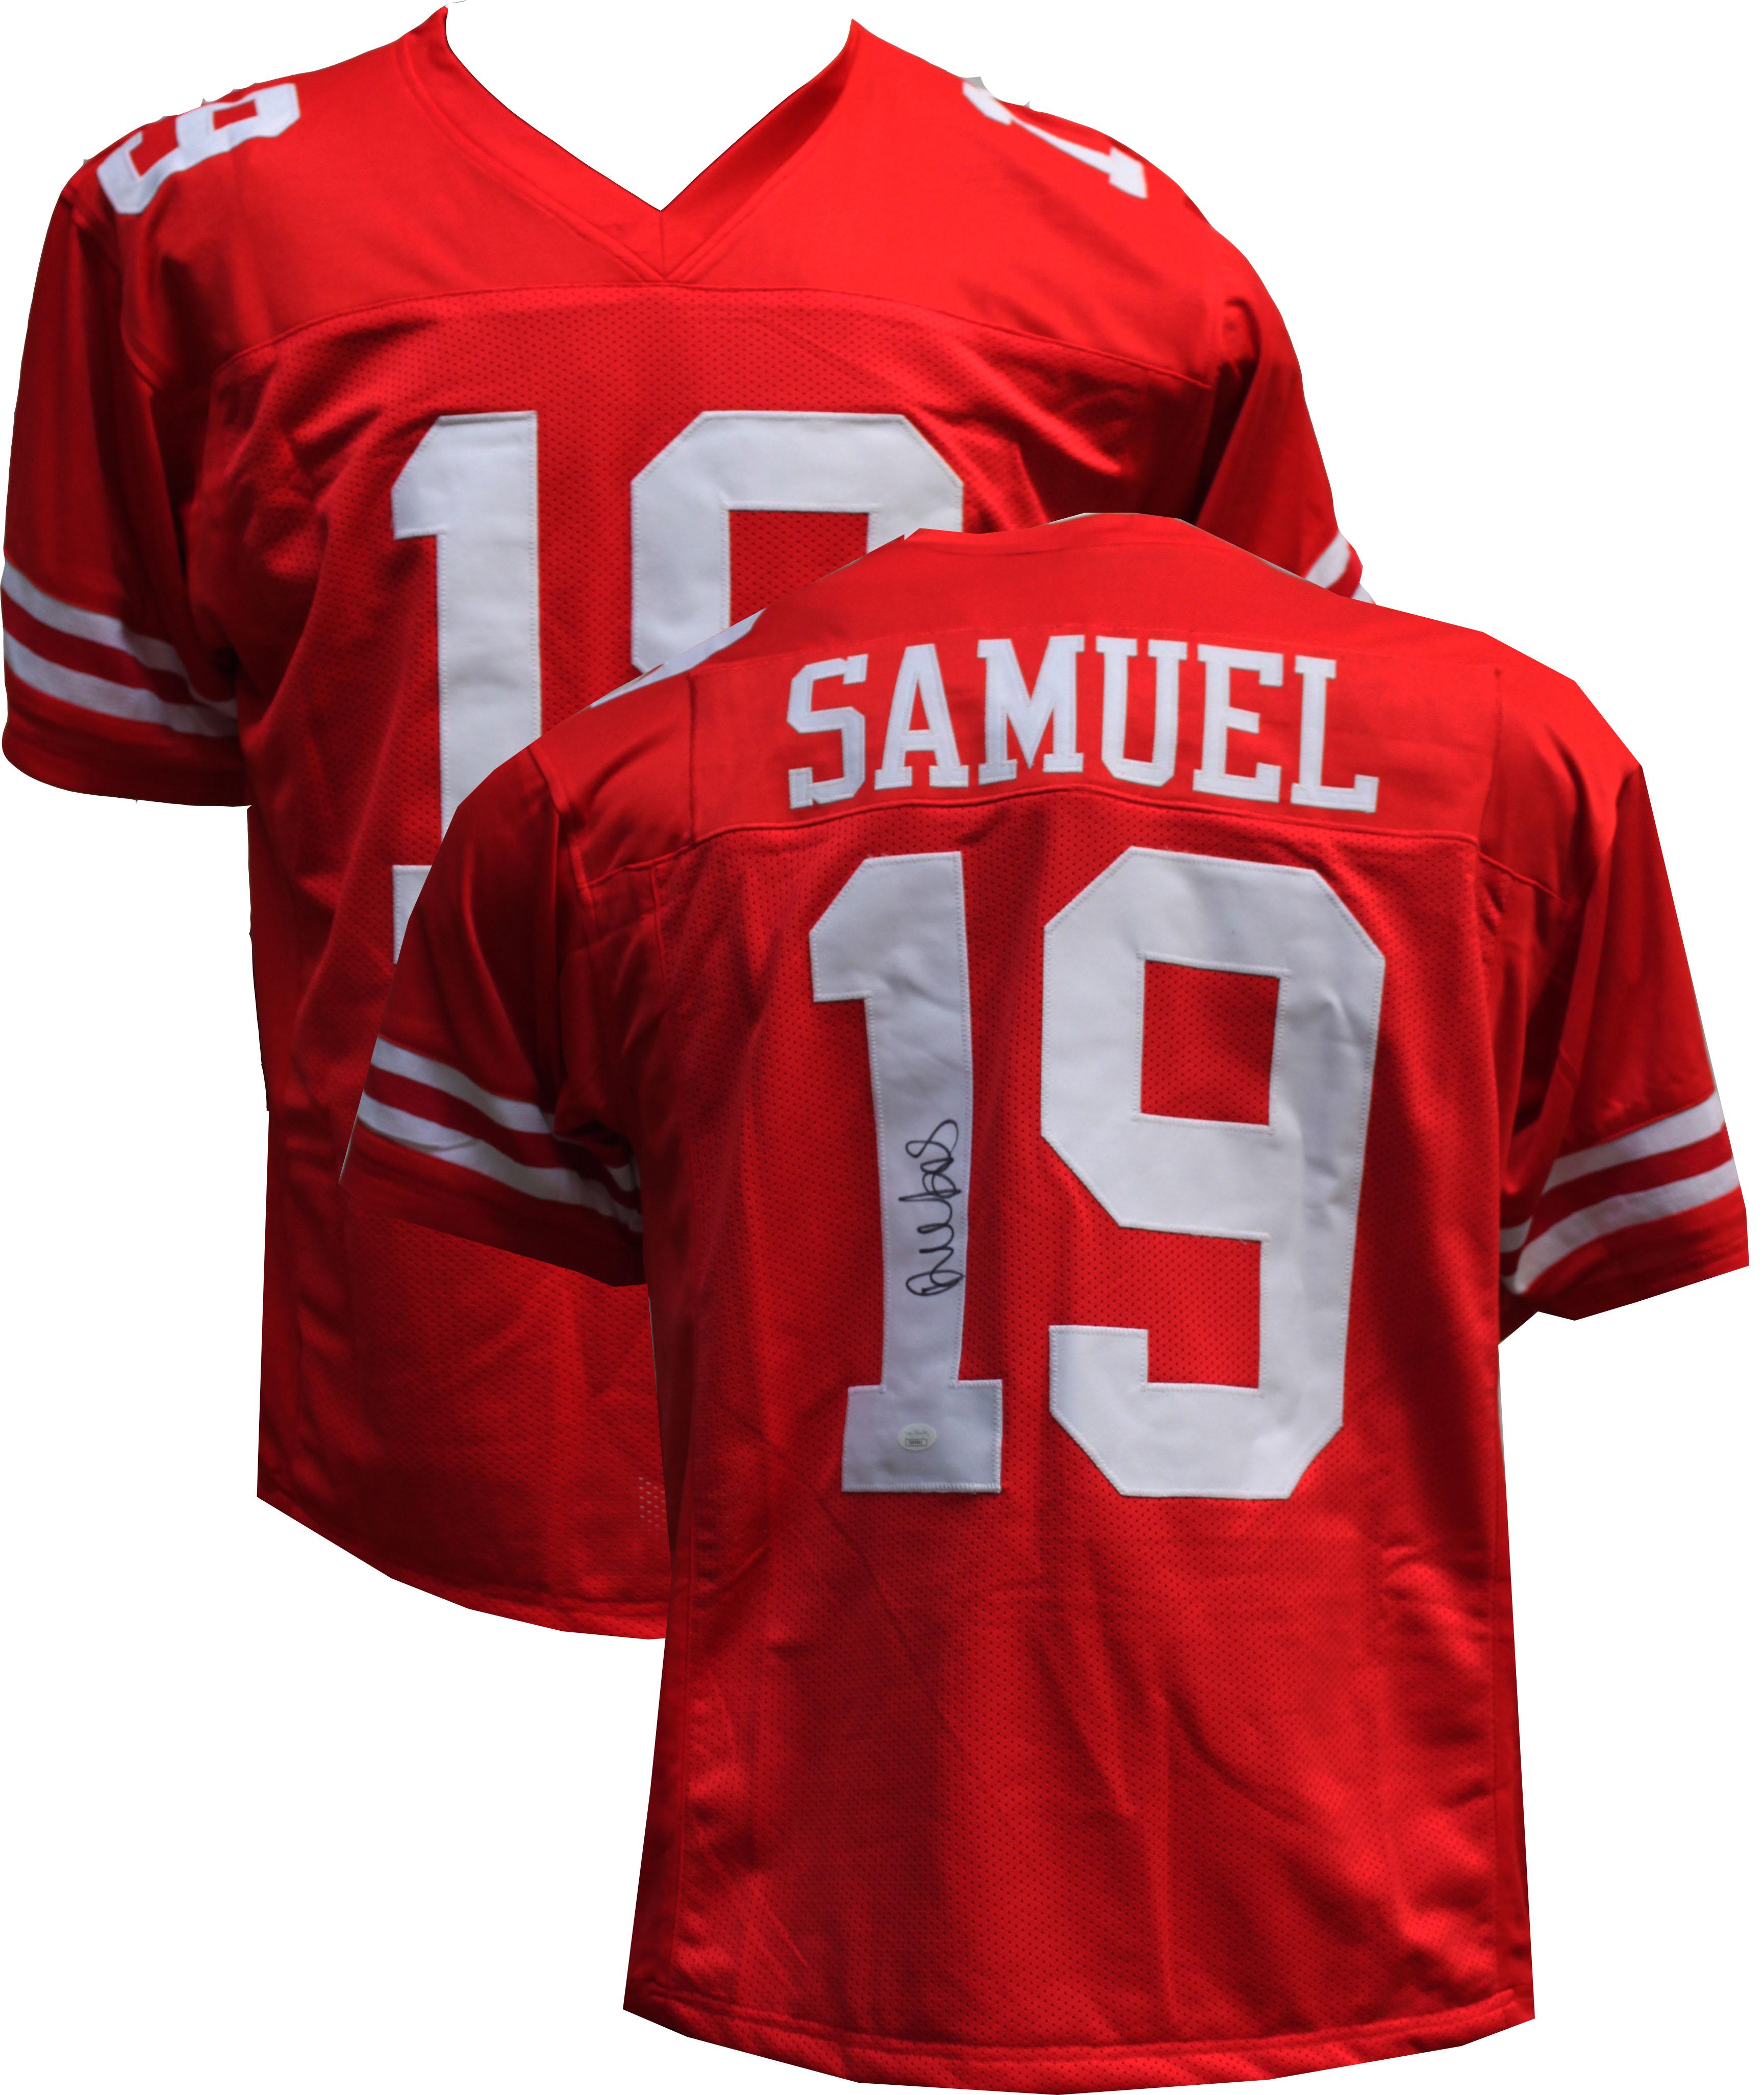 M,L,XL,2XL,3XL DEEBO SAMUEL San Francisco 49ers Unsigned Custom Red Sewn New Football Jersey Size S